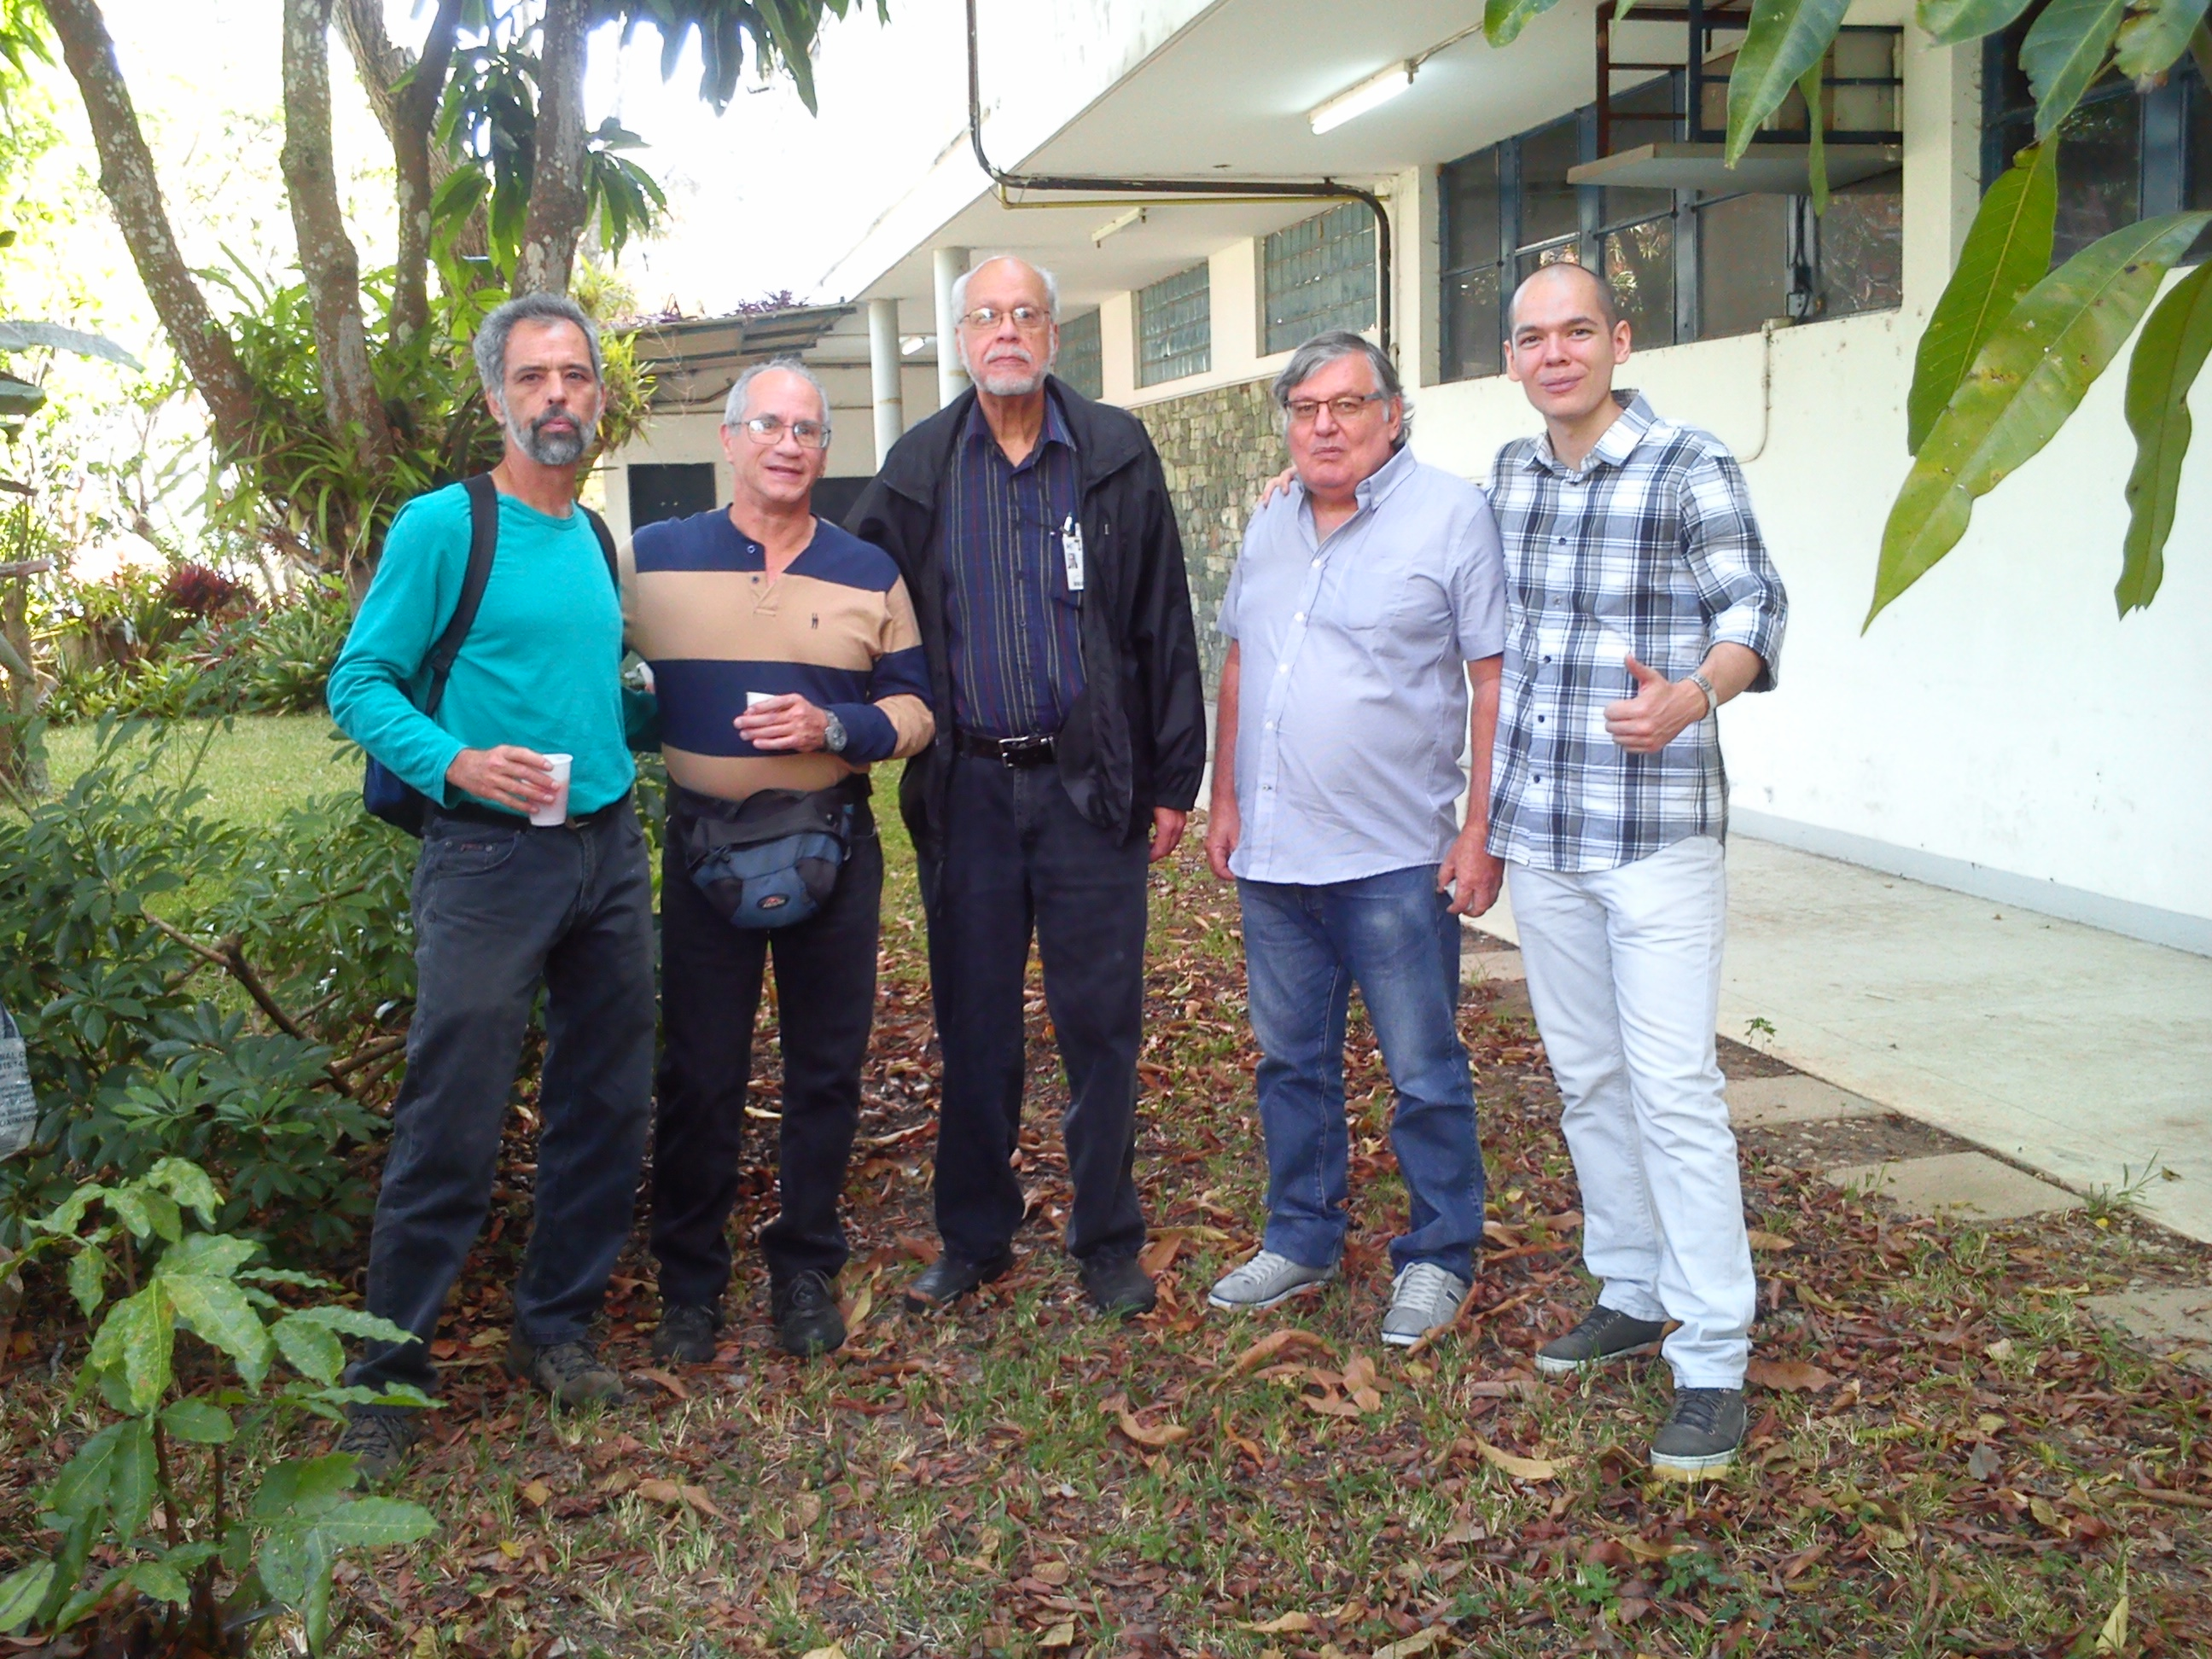 Gustavo Márquez, Lorenzo Alamo, Raúl Padrón, Antonio Pinto and sebastian Duno